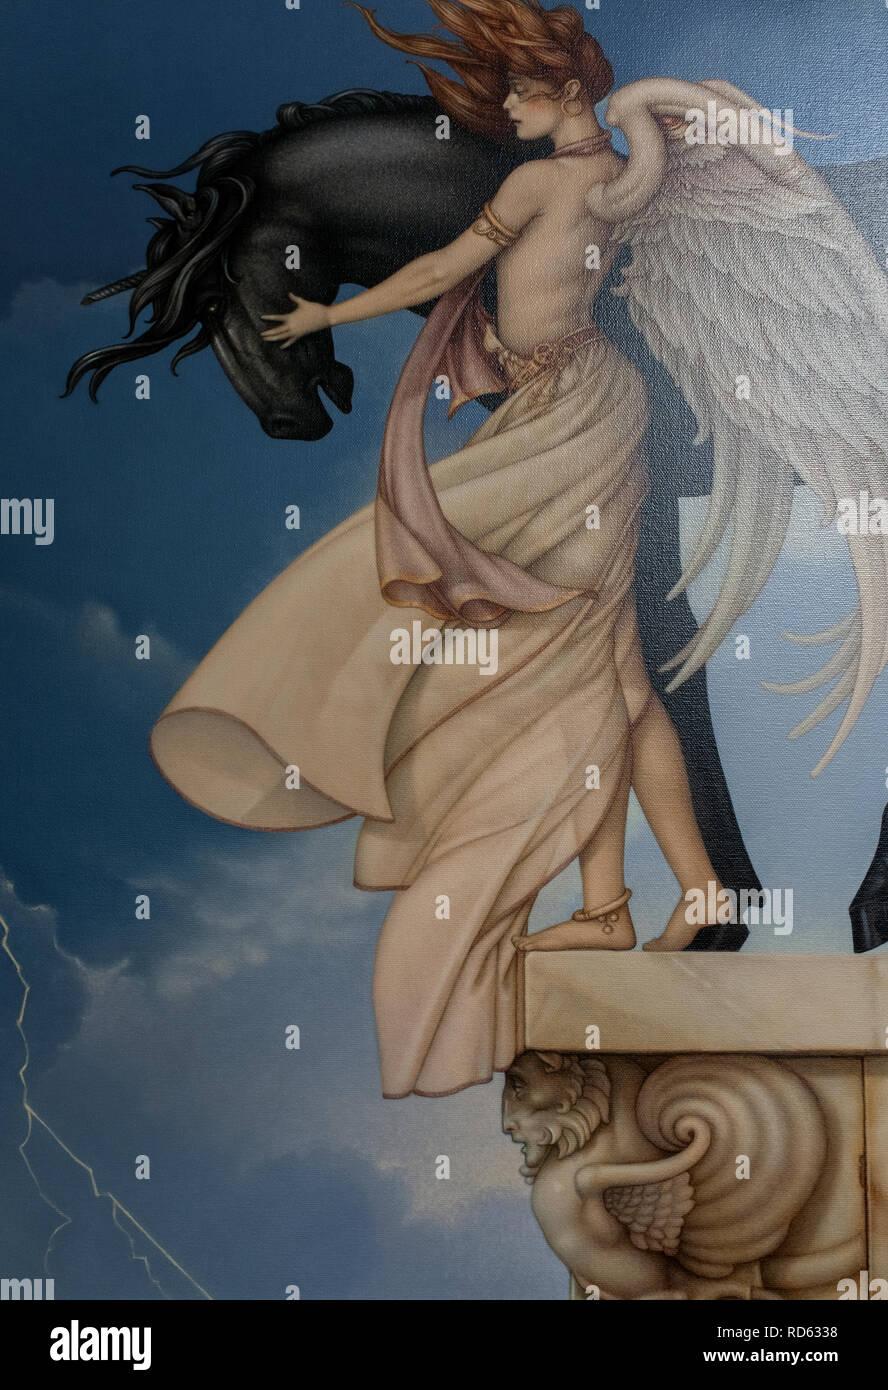 Michael Parkes, magical realist painter: (detail) 'Dark Unicorn' masterworks on canvas - Stock Image